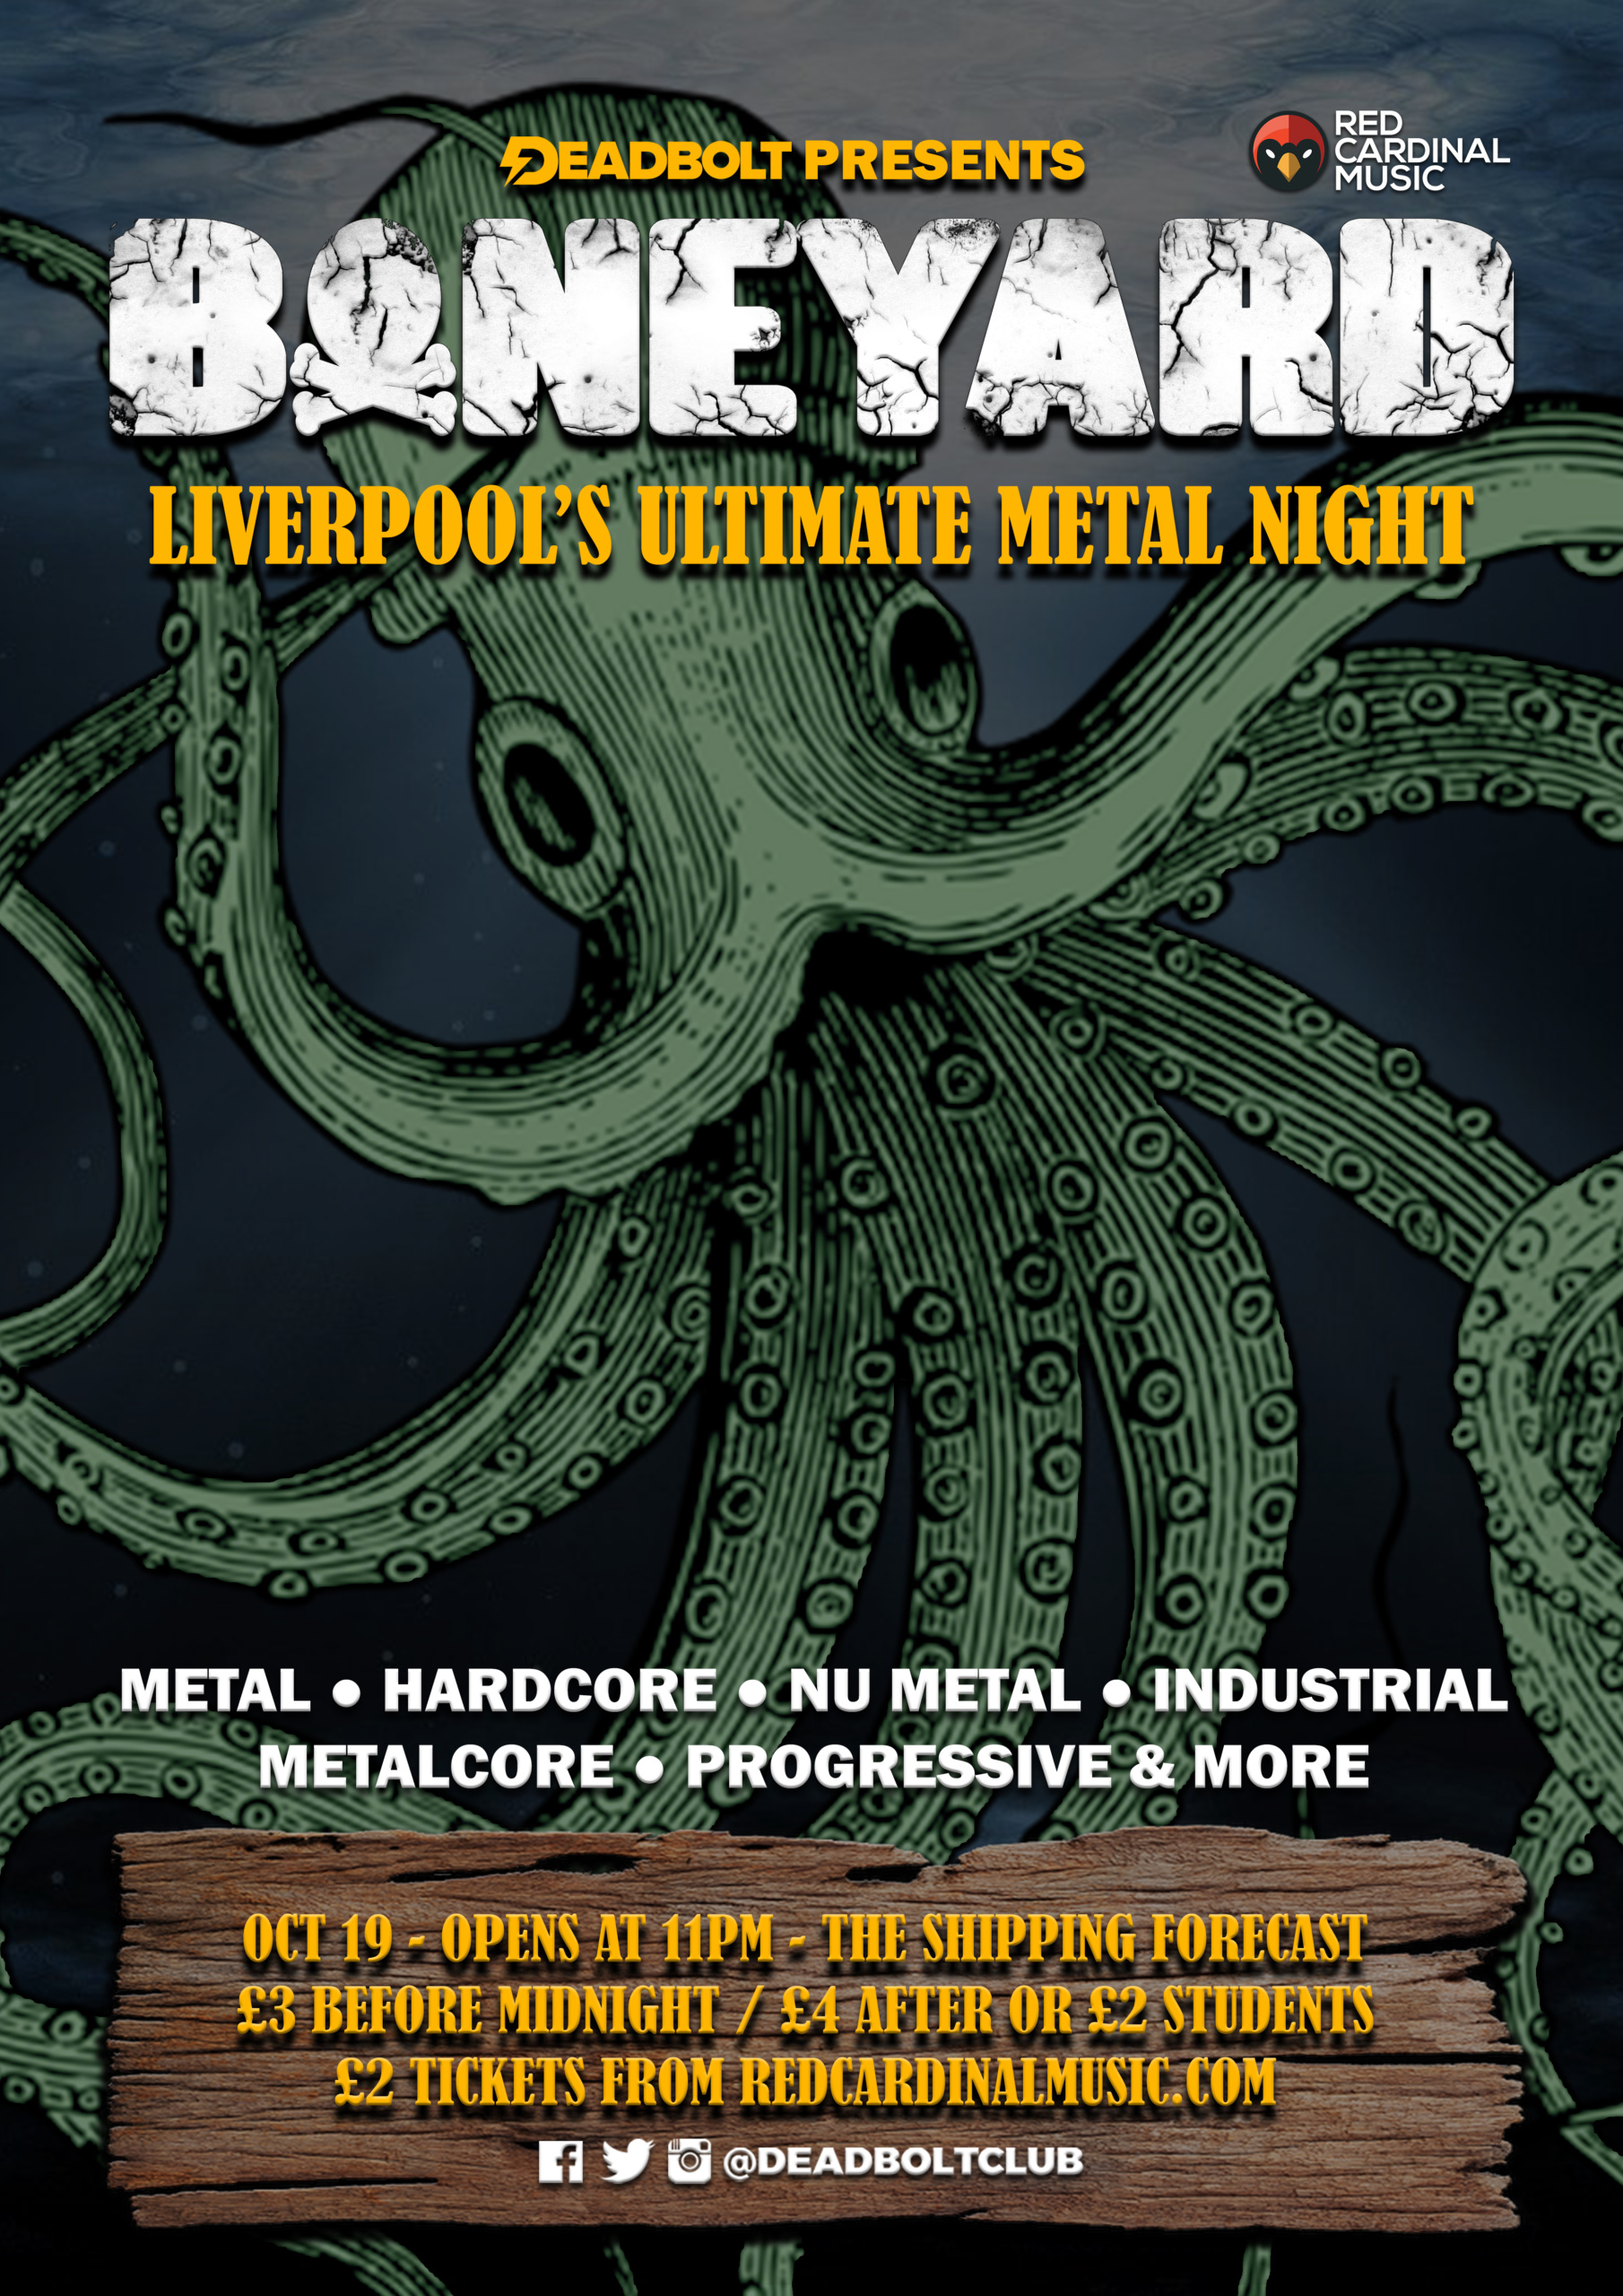 Boneyard Metal Night - Shipping Forecast Liverpool - Oct 19 - Poster - Red Cardinal Music